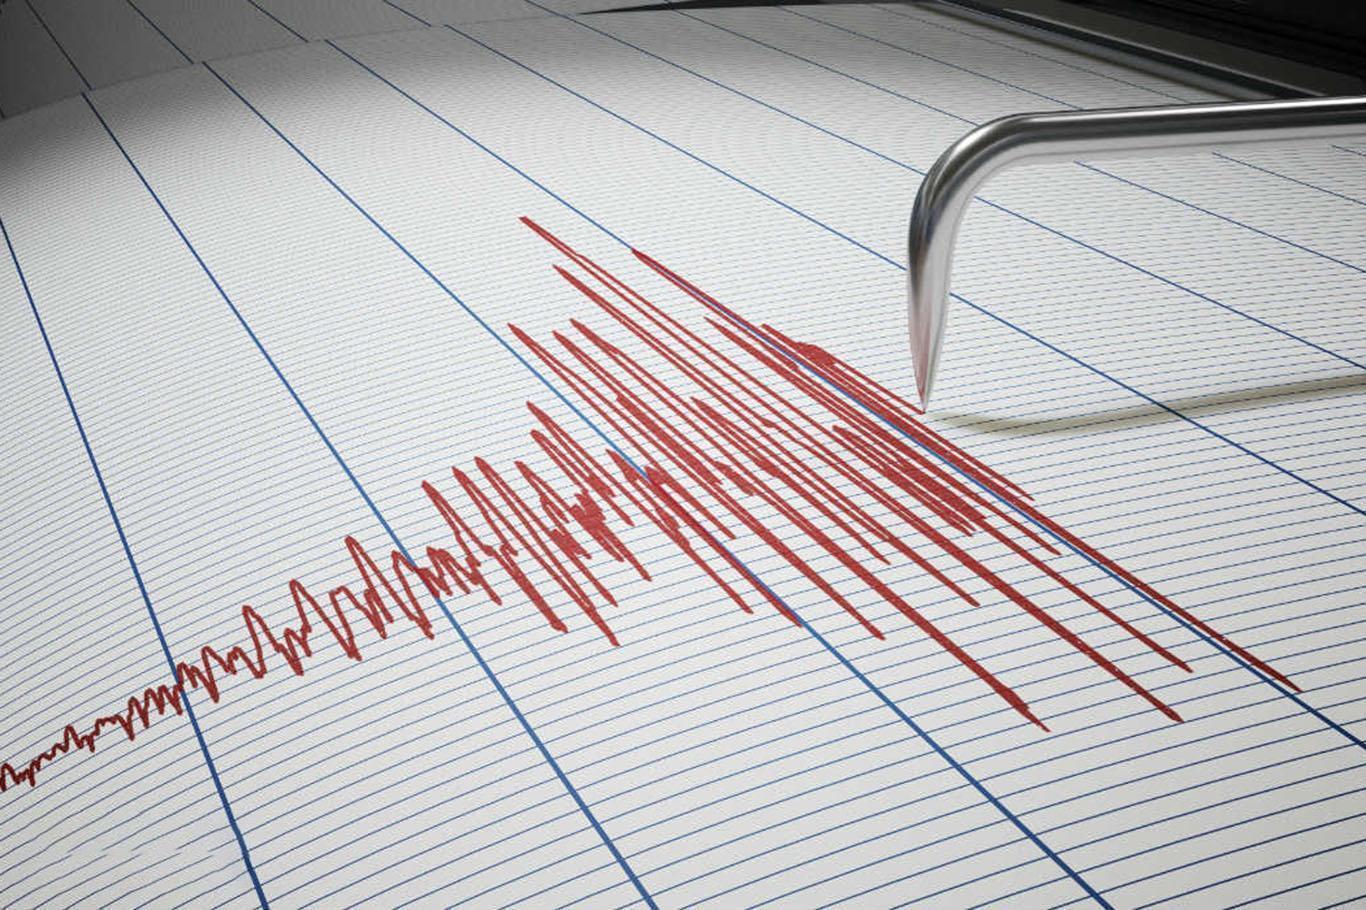 5.3-magnitude earthquake struck al-Sulaymaniyah